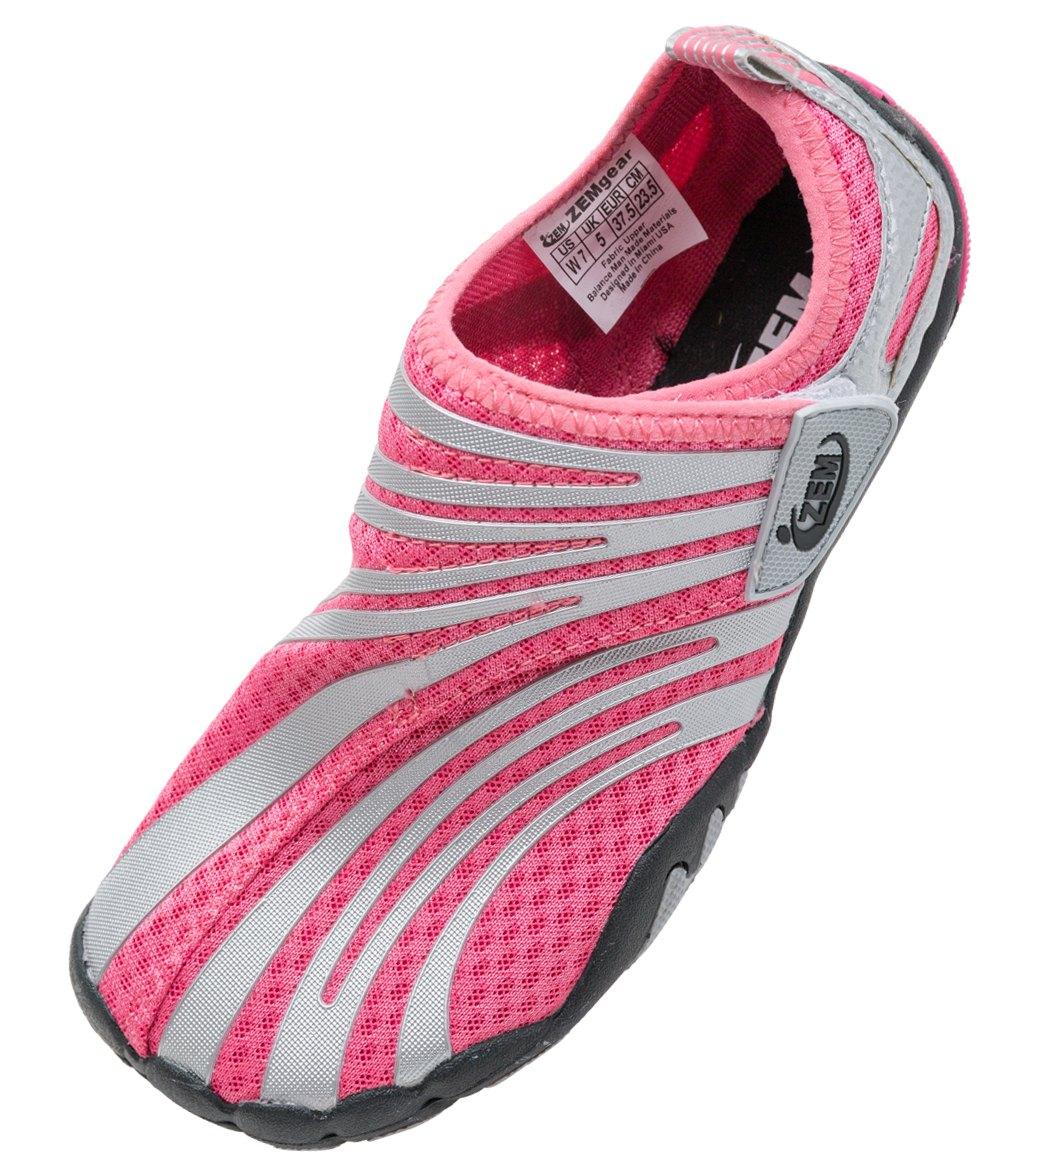 c6bb11274a98 Zemgear Women s TerraRAZ Water Shoes at SwimOutlet.com - Free ...